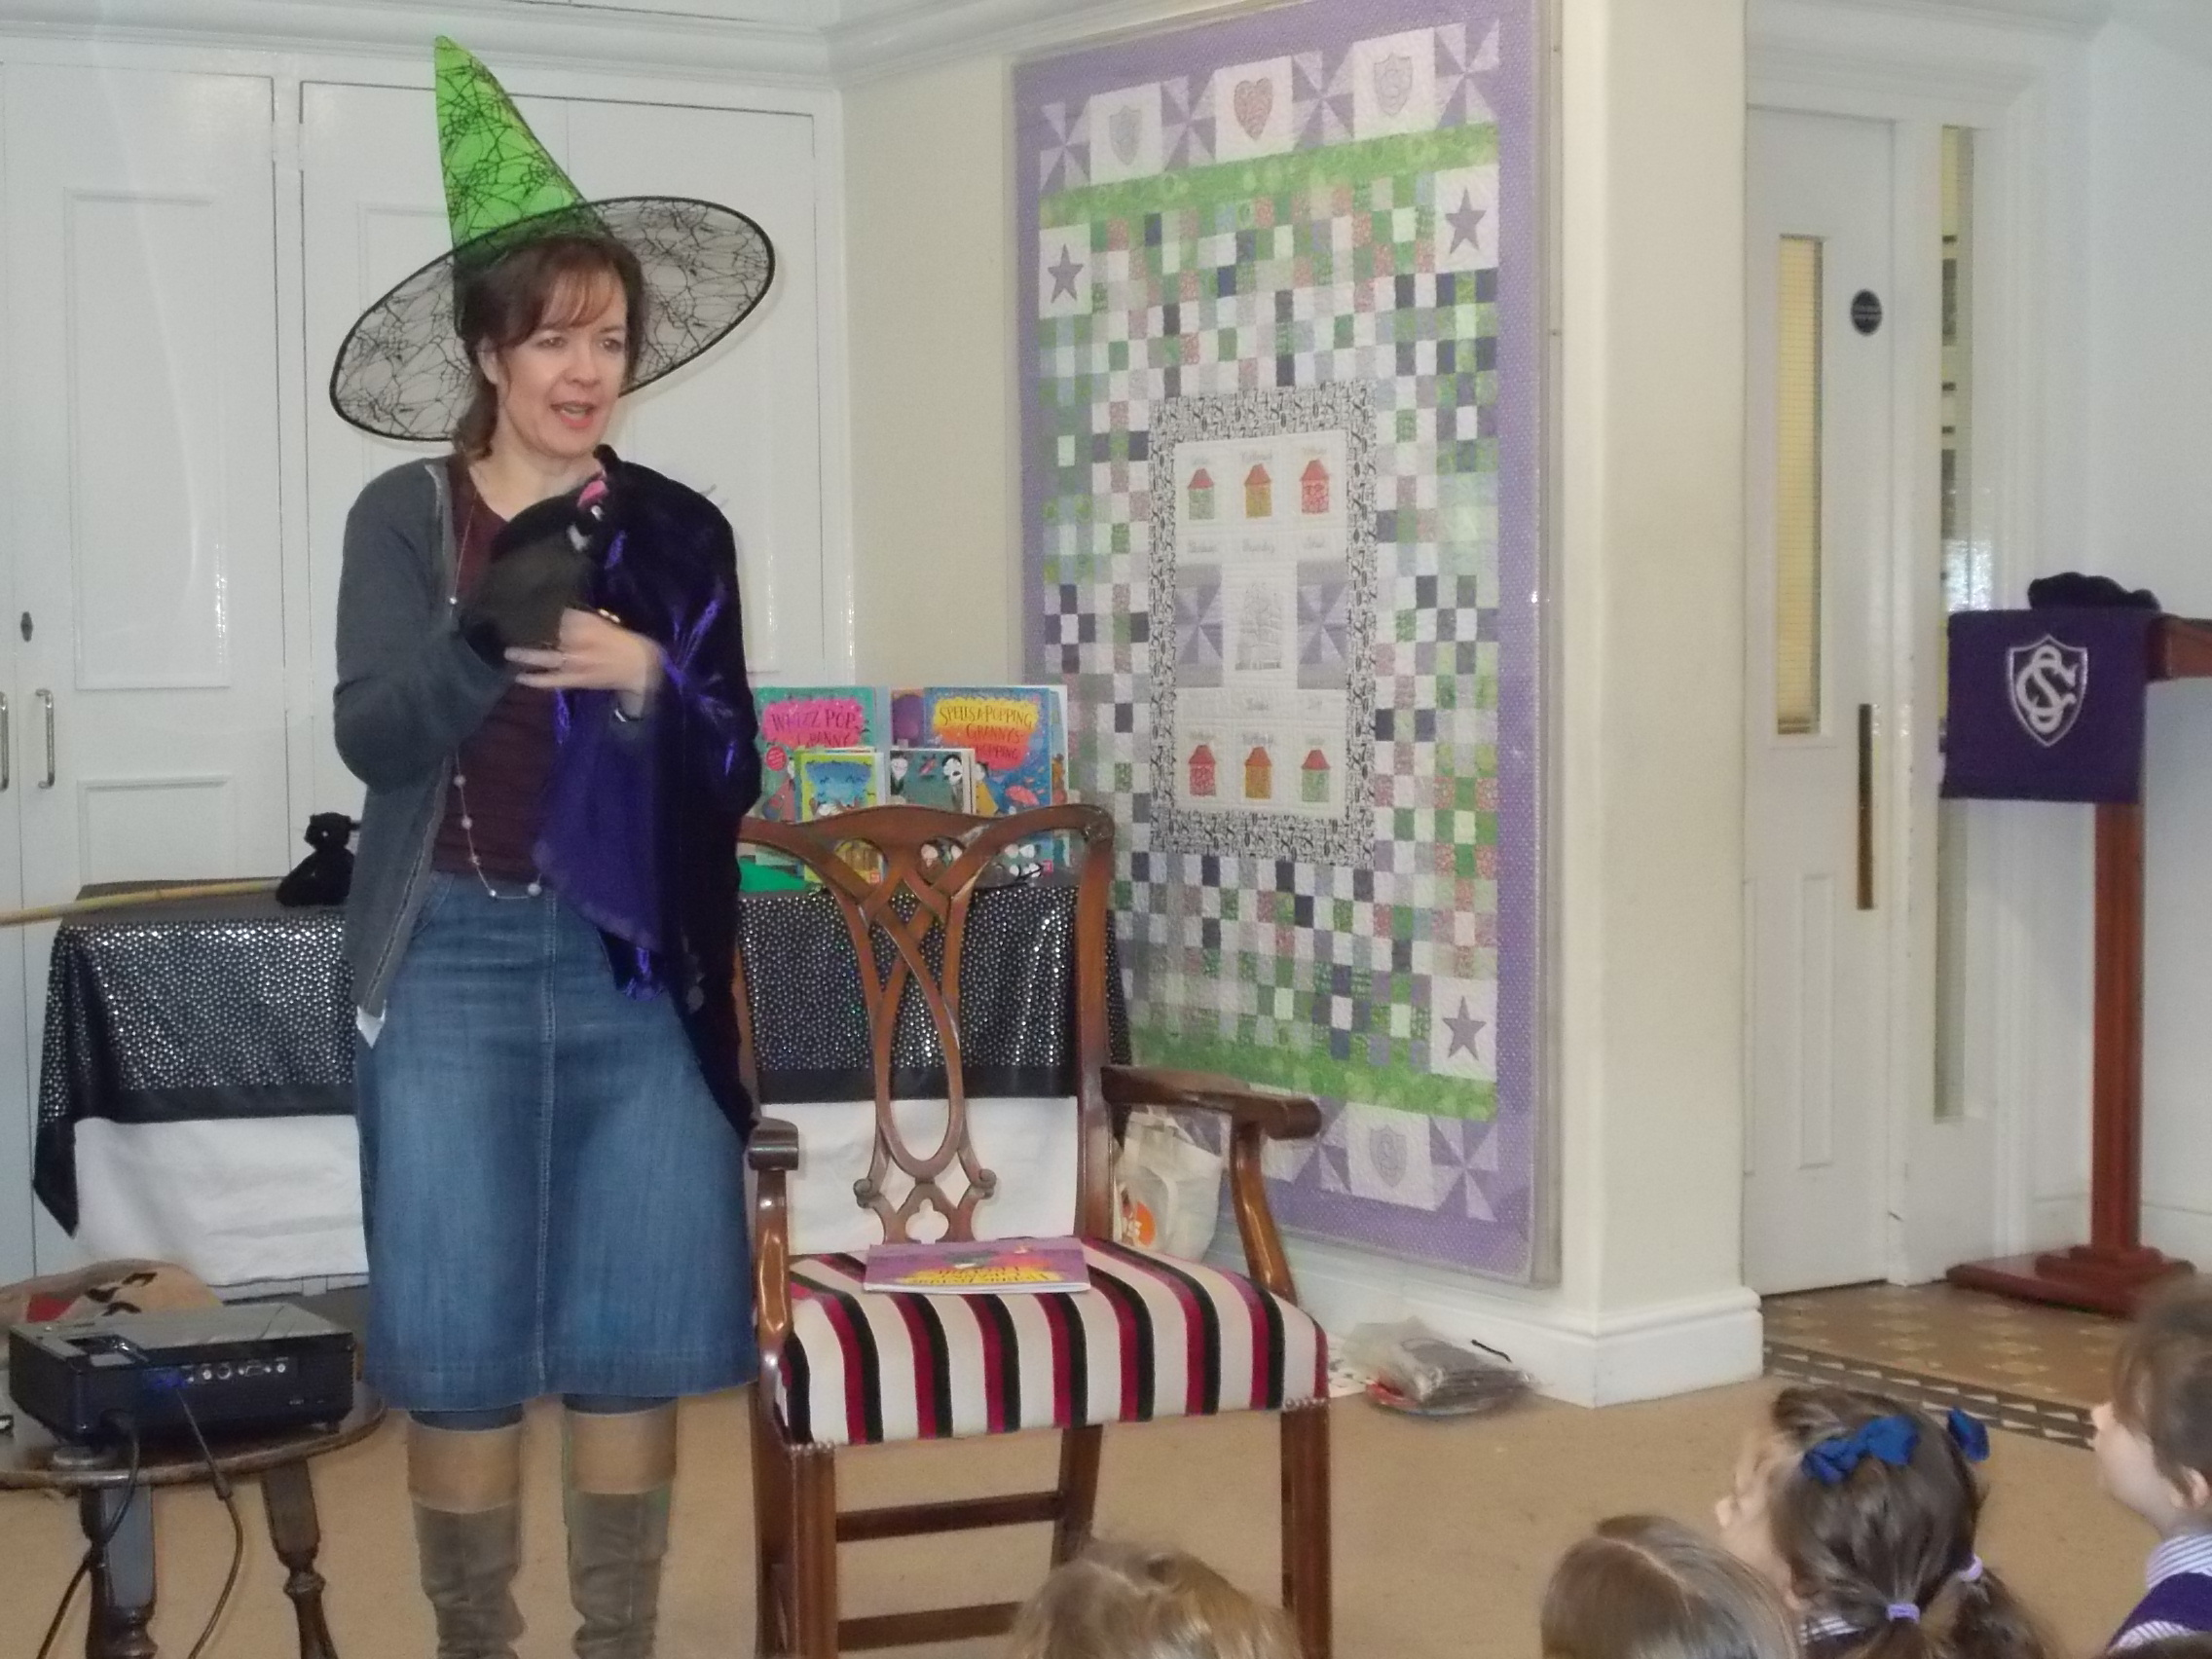 Tracey Corderoy visit 039.JPG